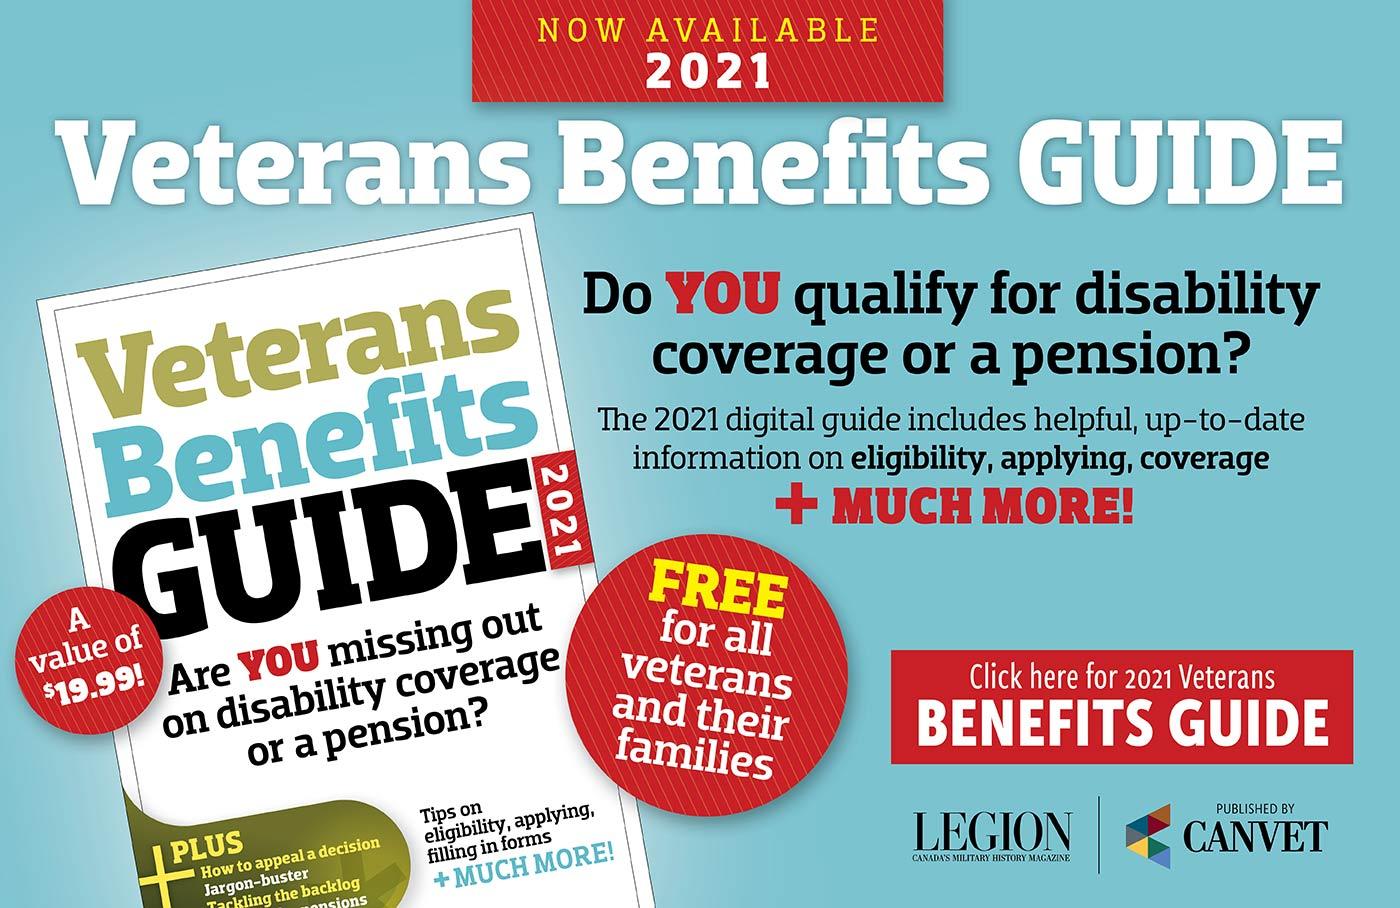 Veterans benefits guide.